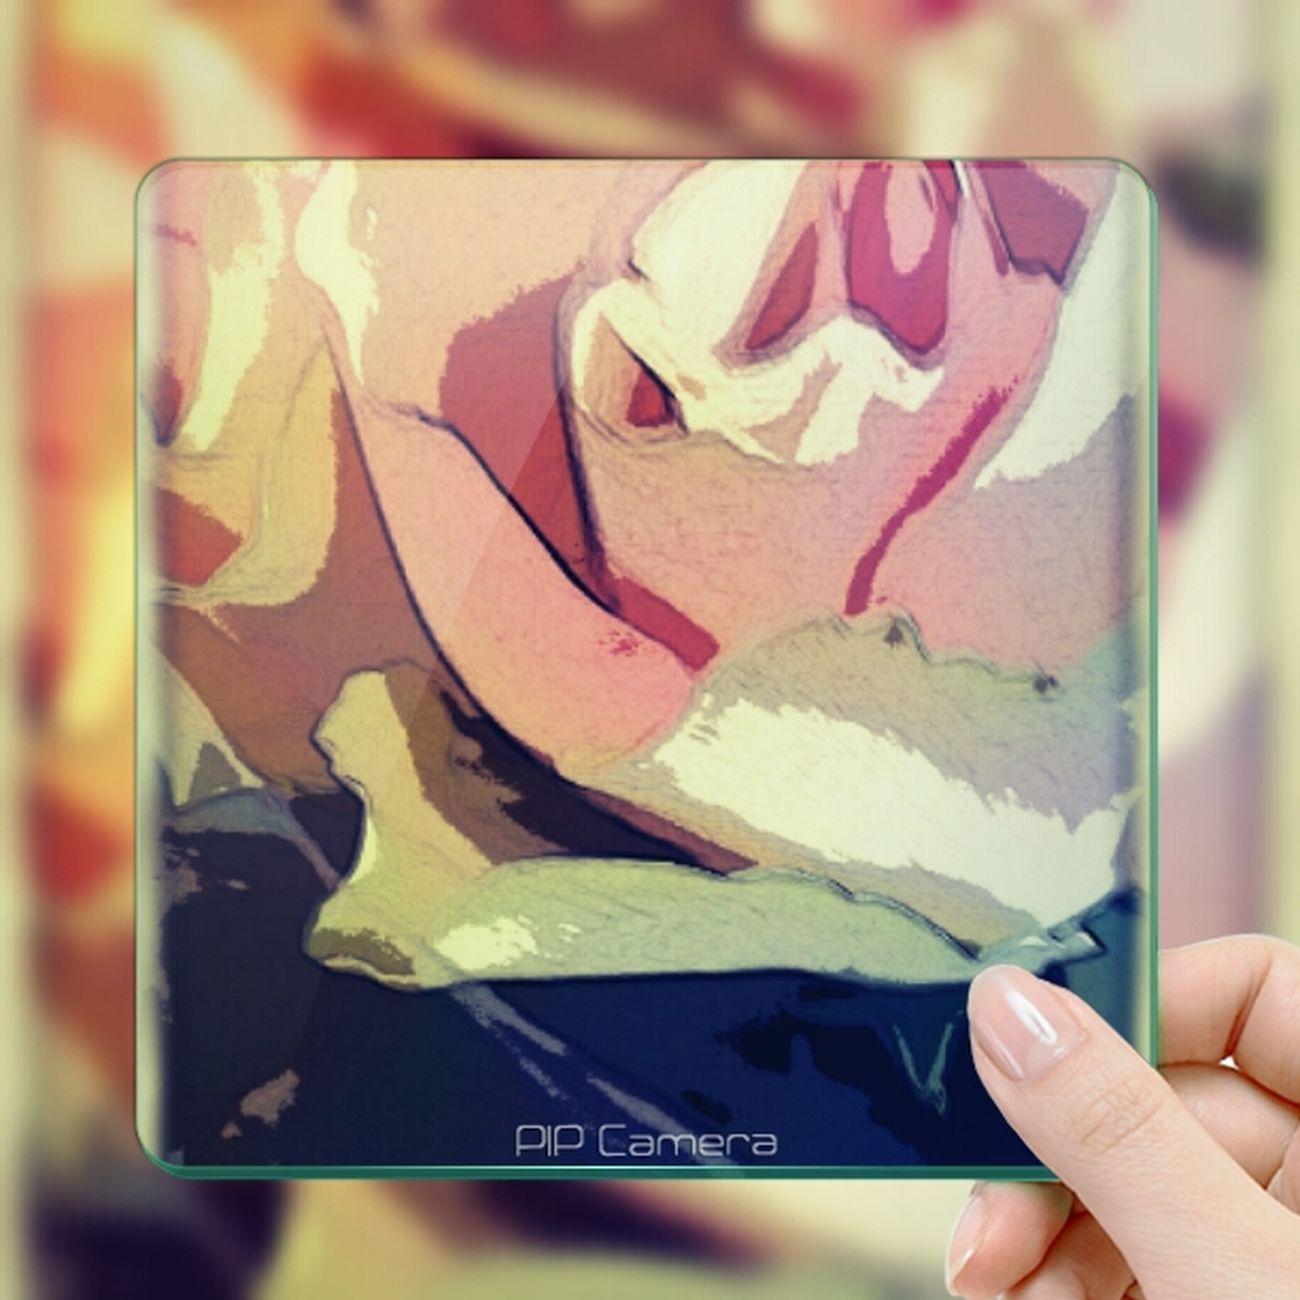 flowerforyou Art Flower Art Instagram #followme #follow #eyeem #awesome #streamzoo #instahub #photo #sigueme #followhim #cute #follow4follow F4f Followback [ Heartflowers photo BloomingGreat streamzoo s Streamzooville